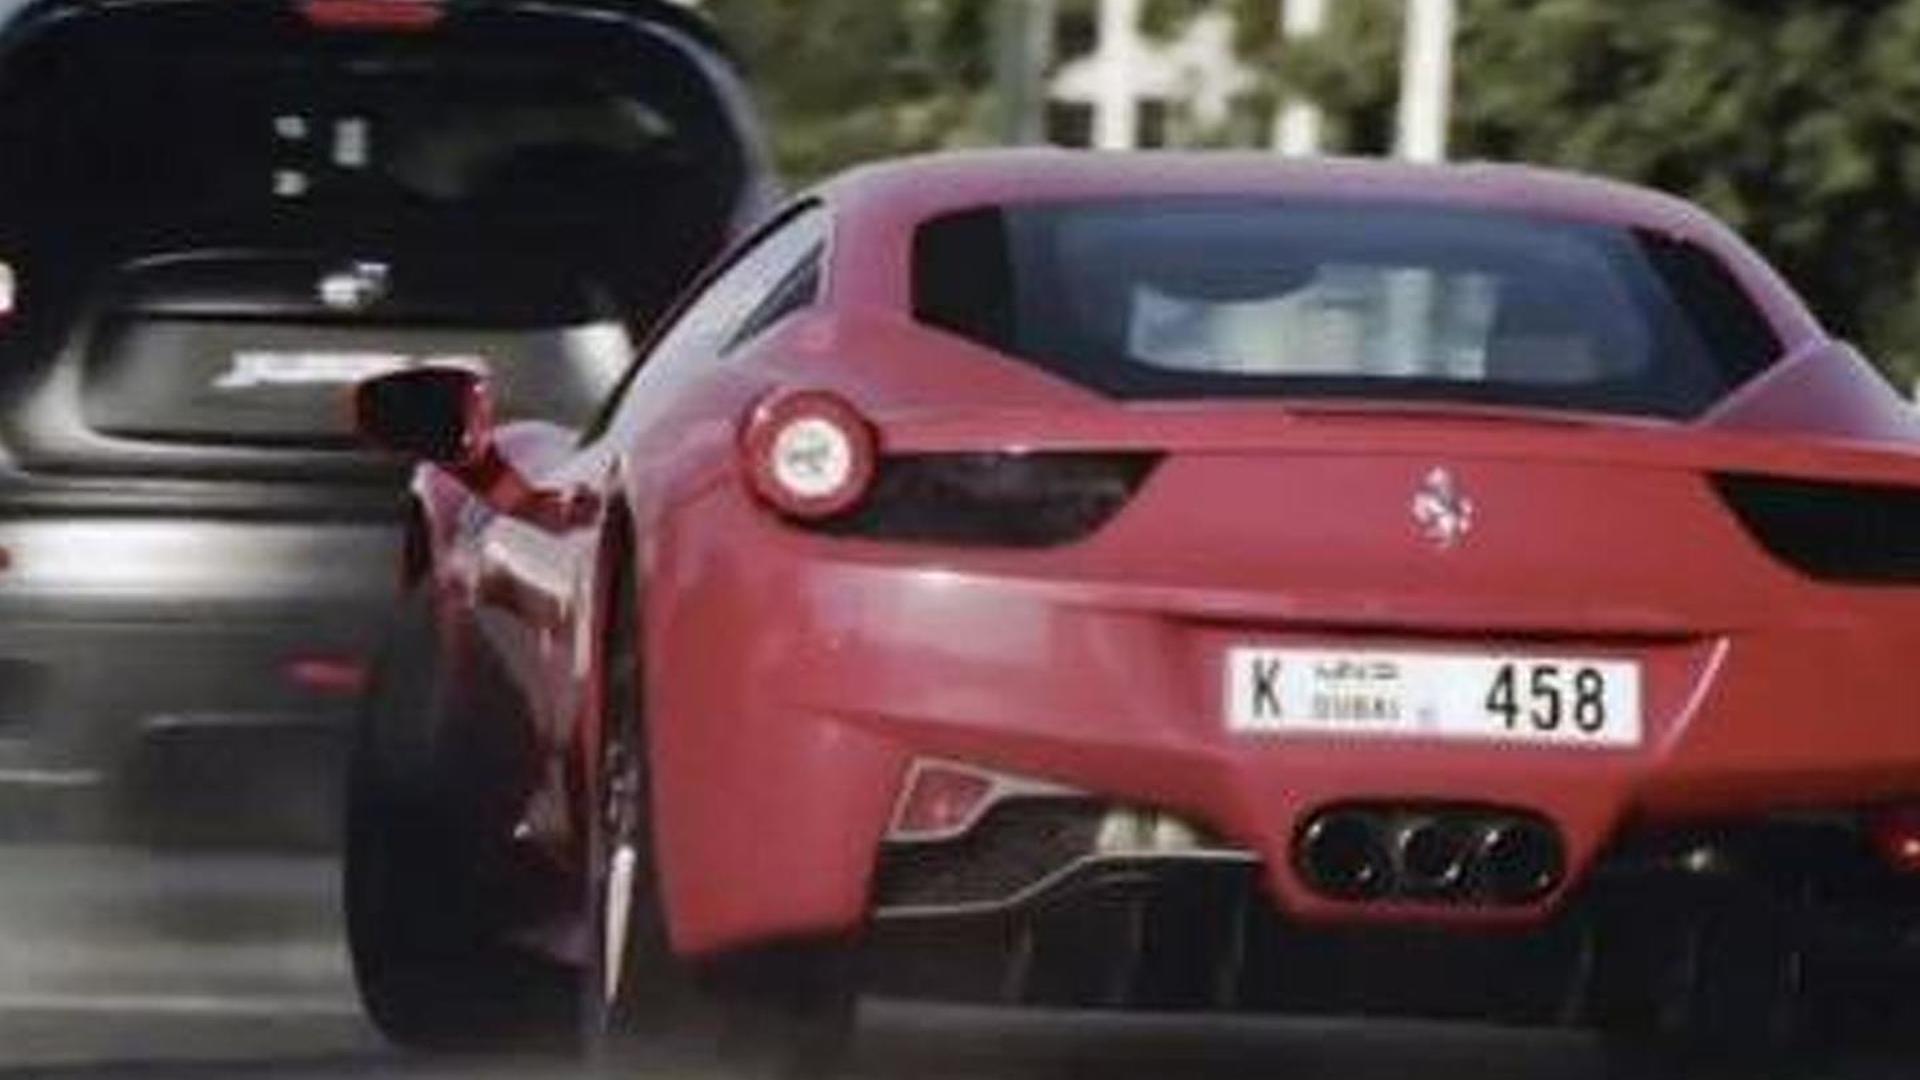 Nissan Juke R Dubai street race film announced [videos]